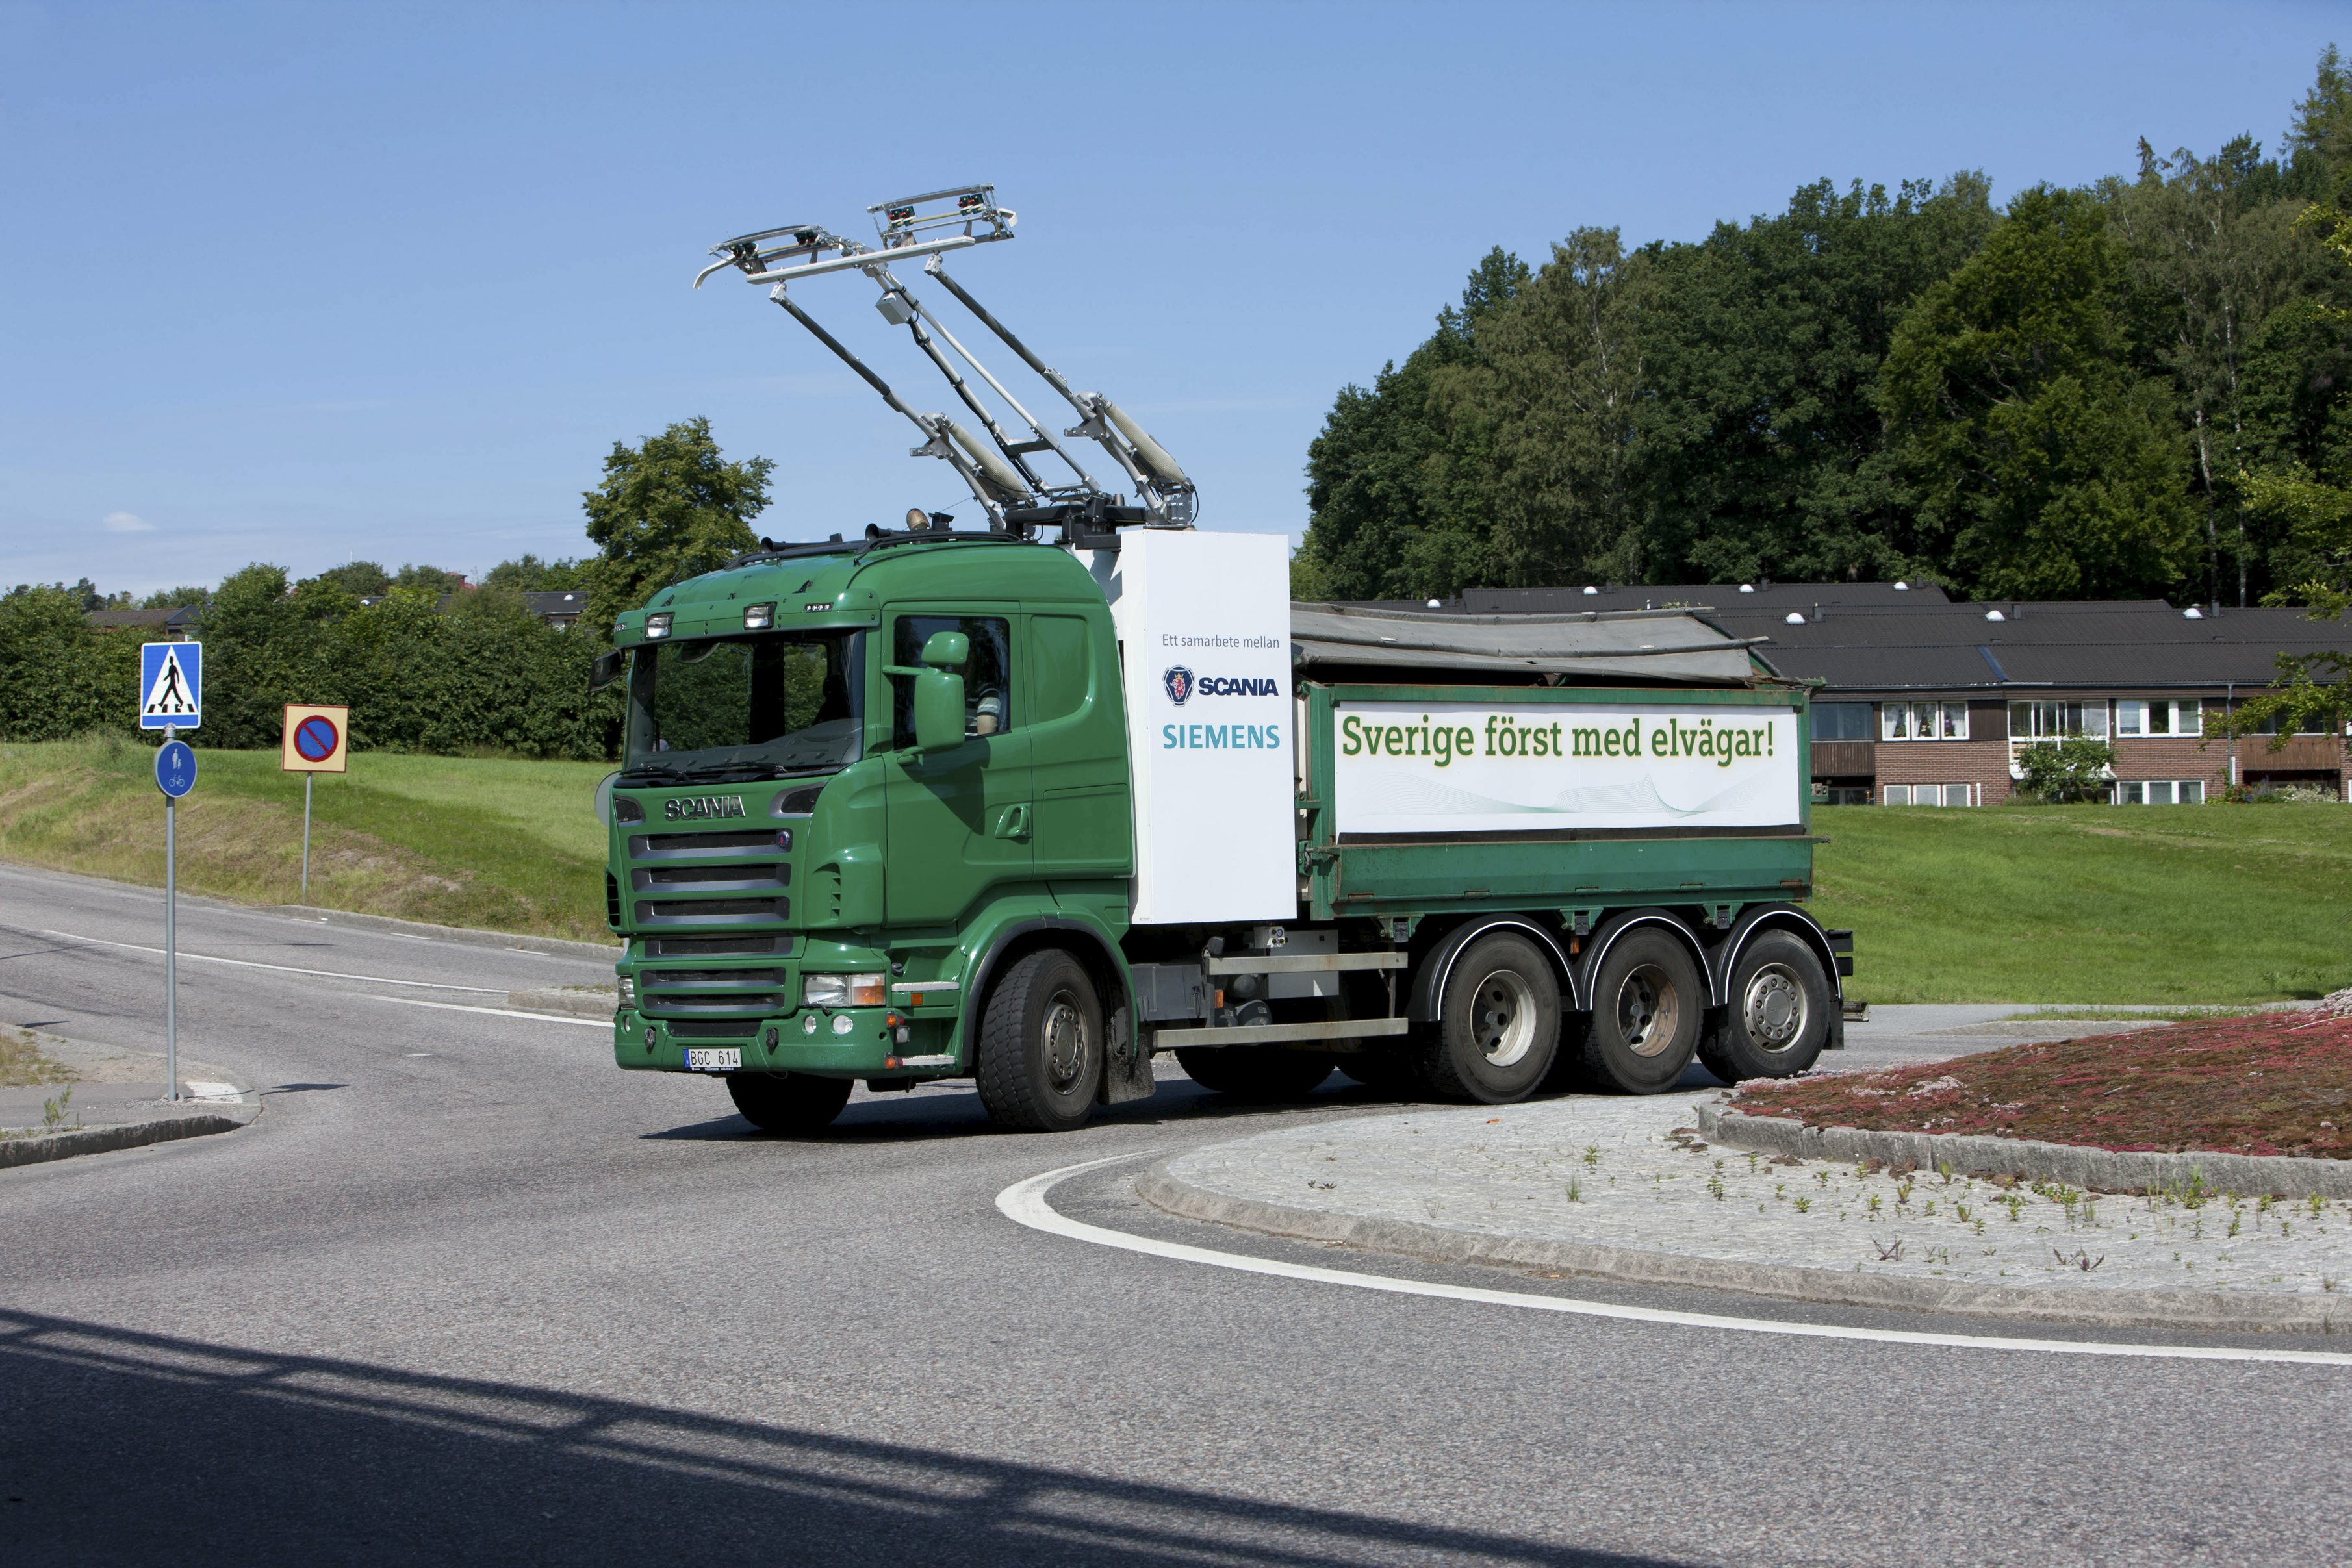 Scania Siemens camion elettrici